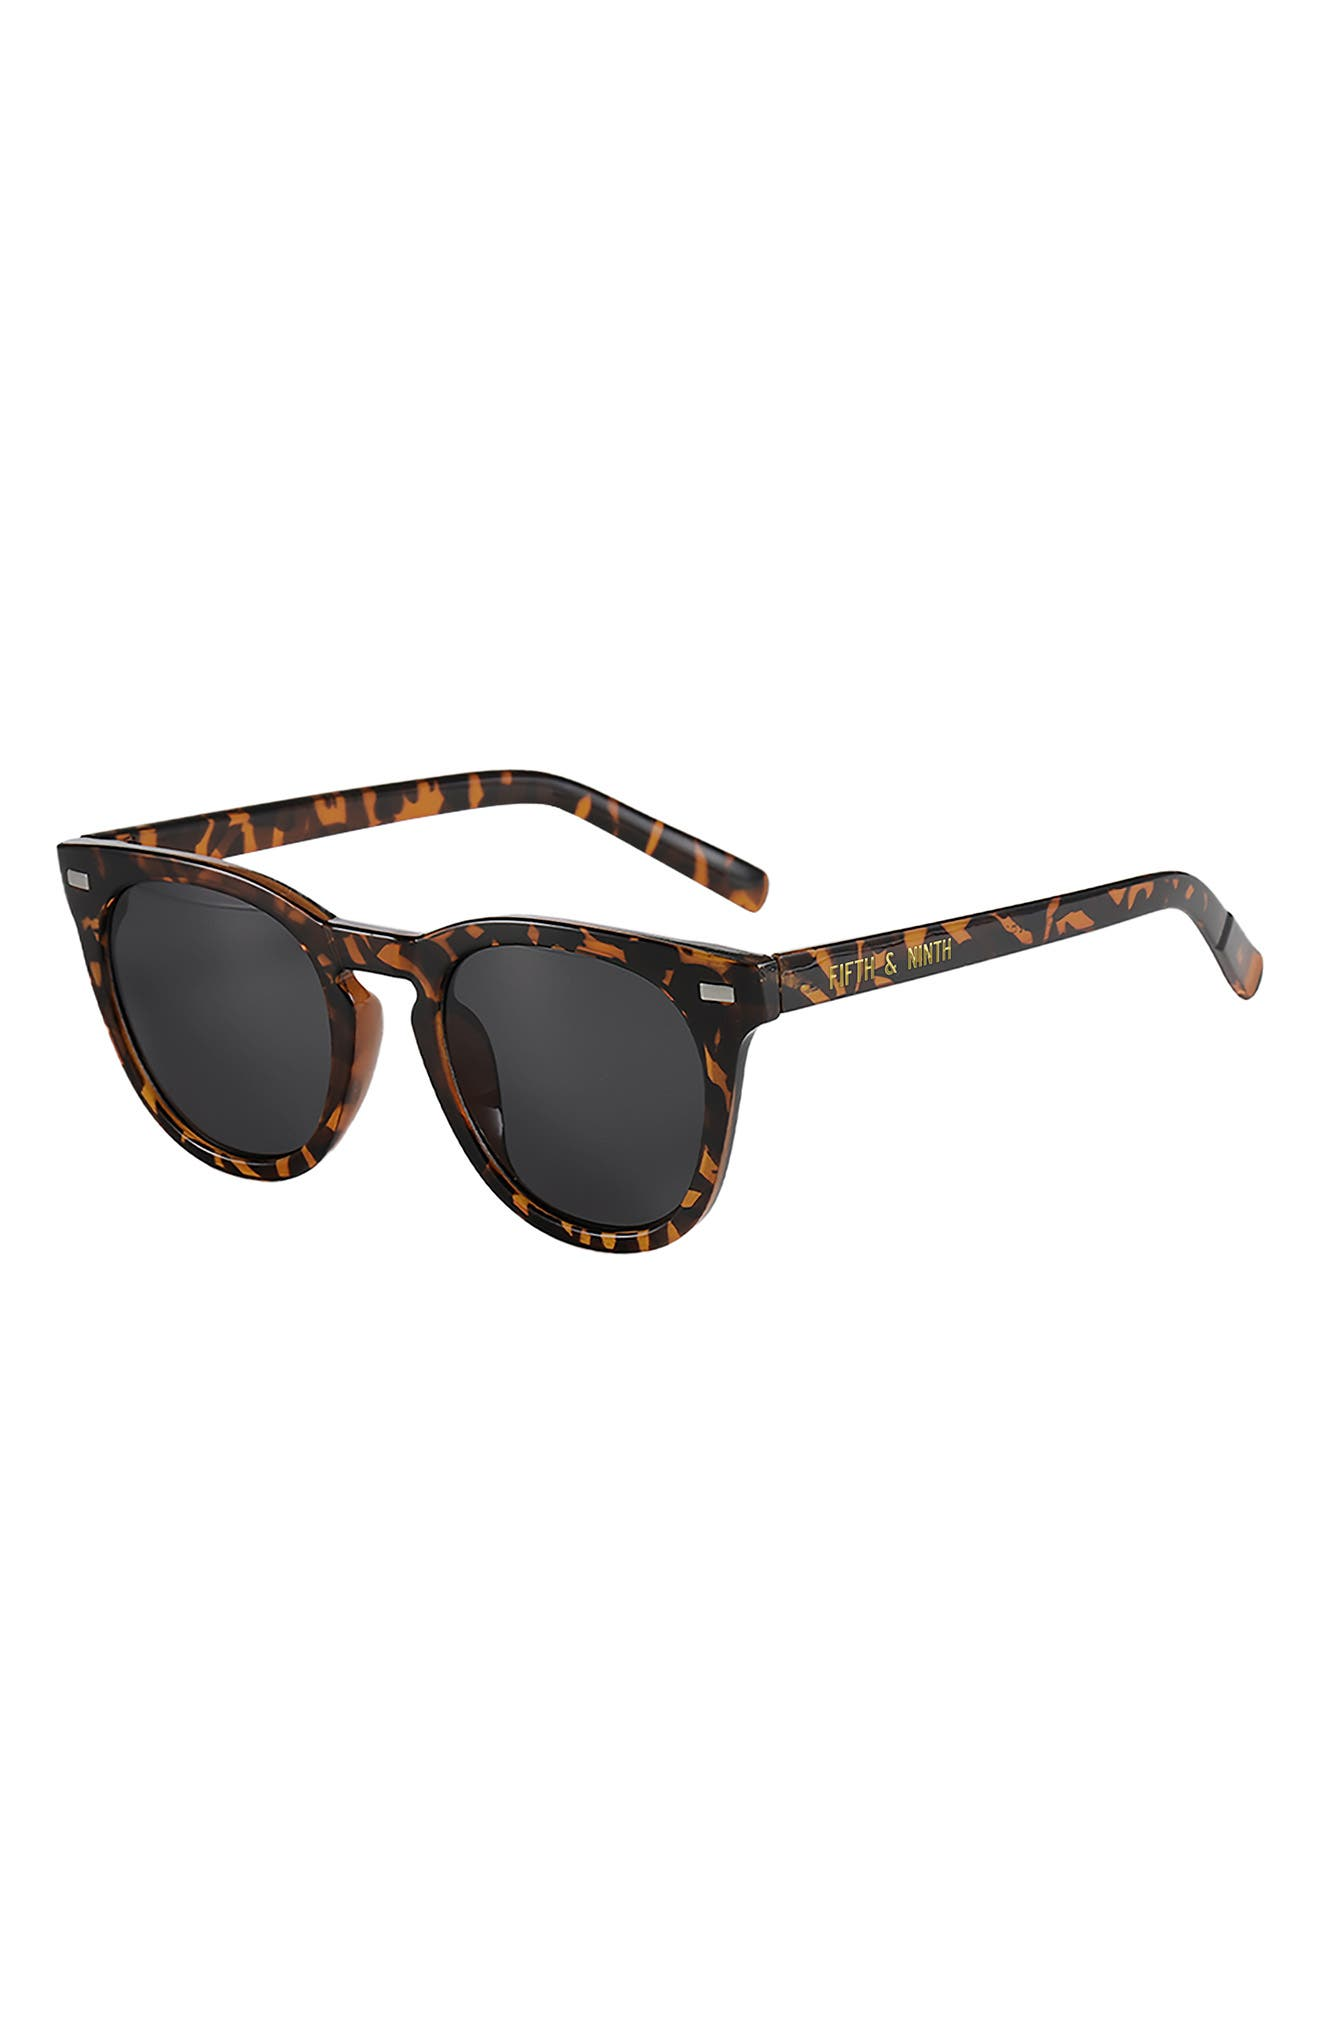 Raleigh 55mm Round Sunglasses